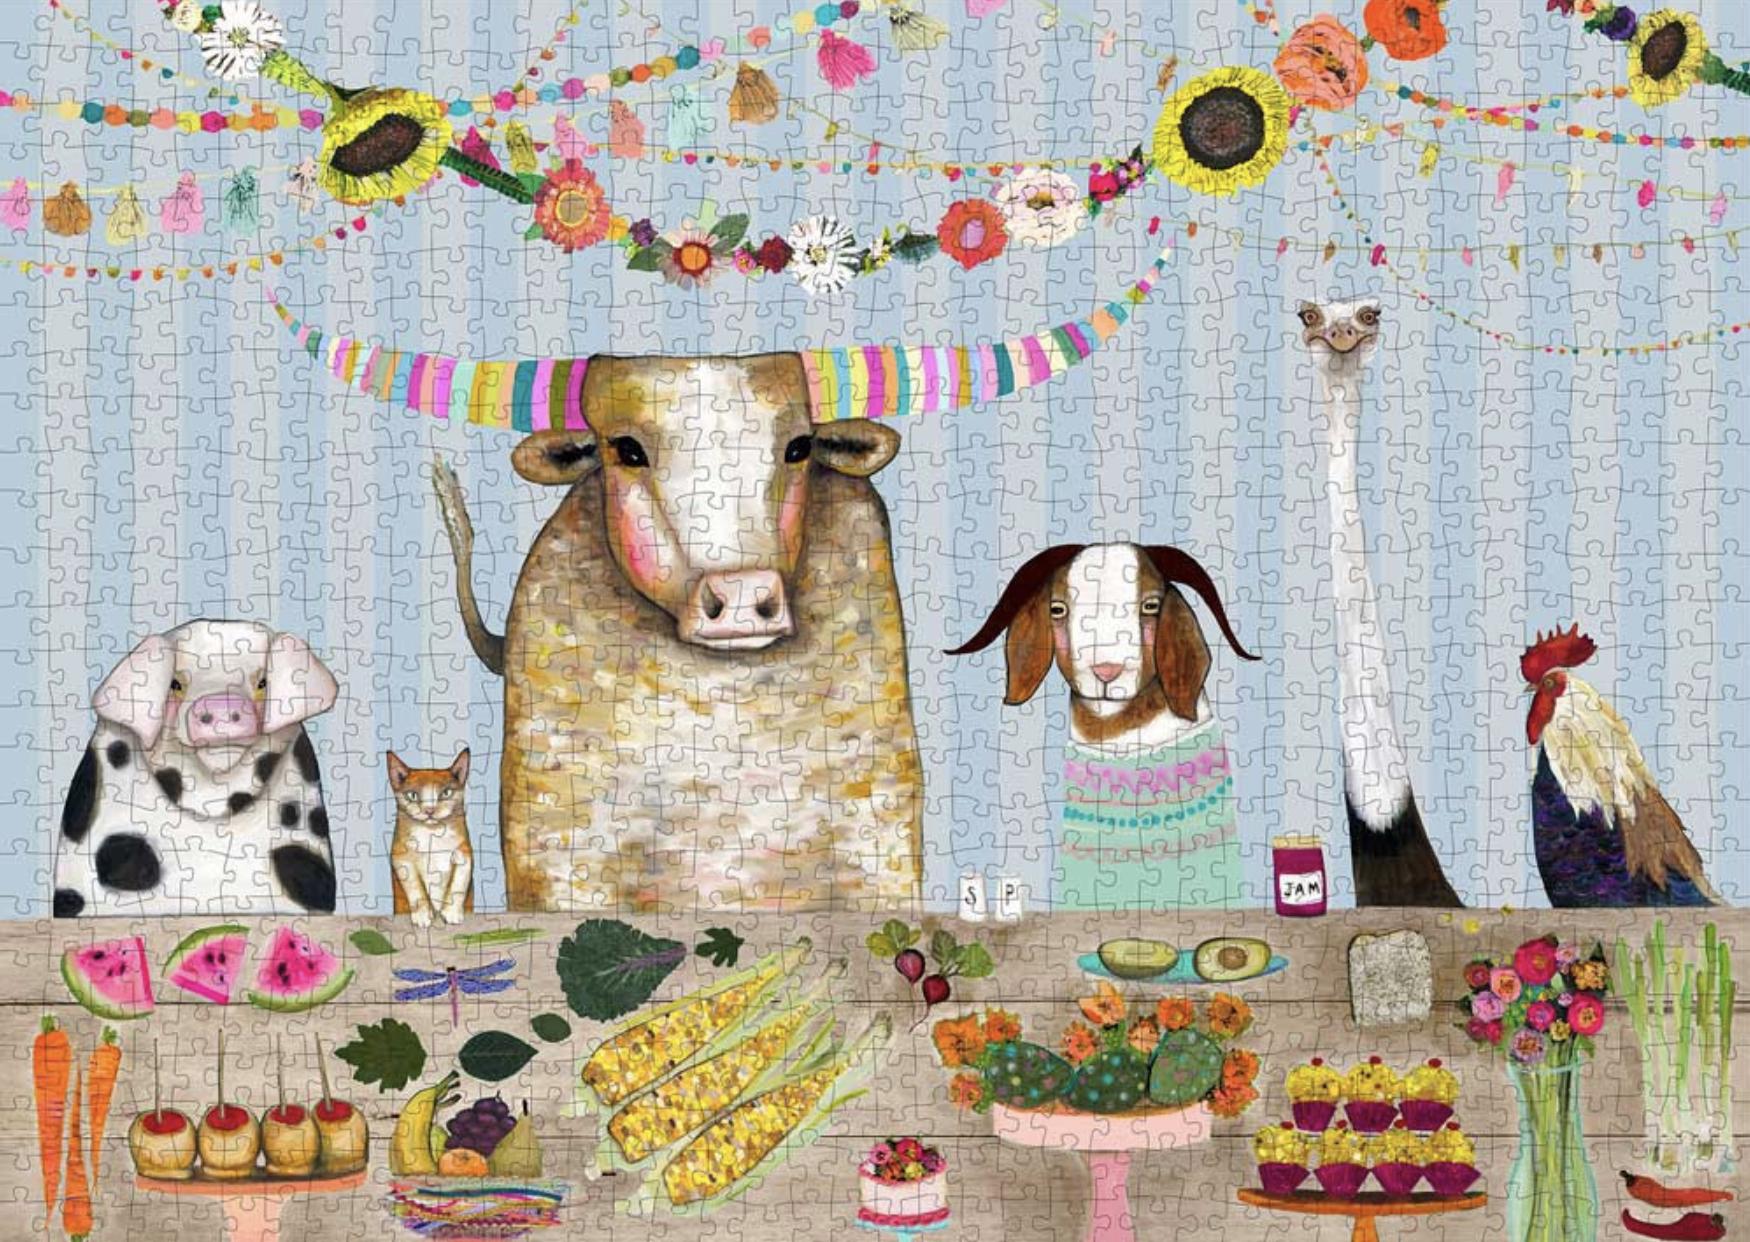 Corn Muffins, 1000 Piece Puzzle